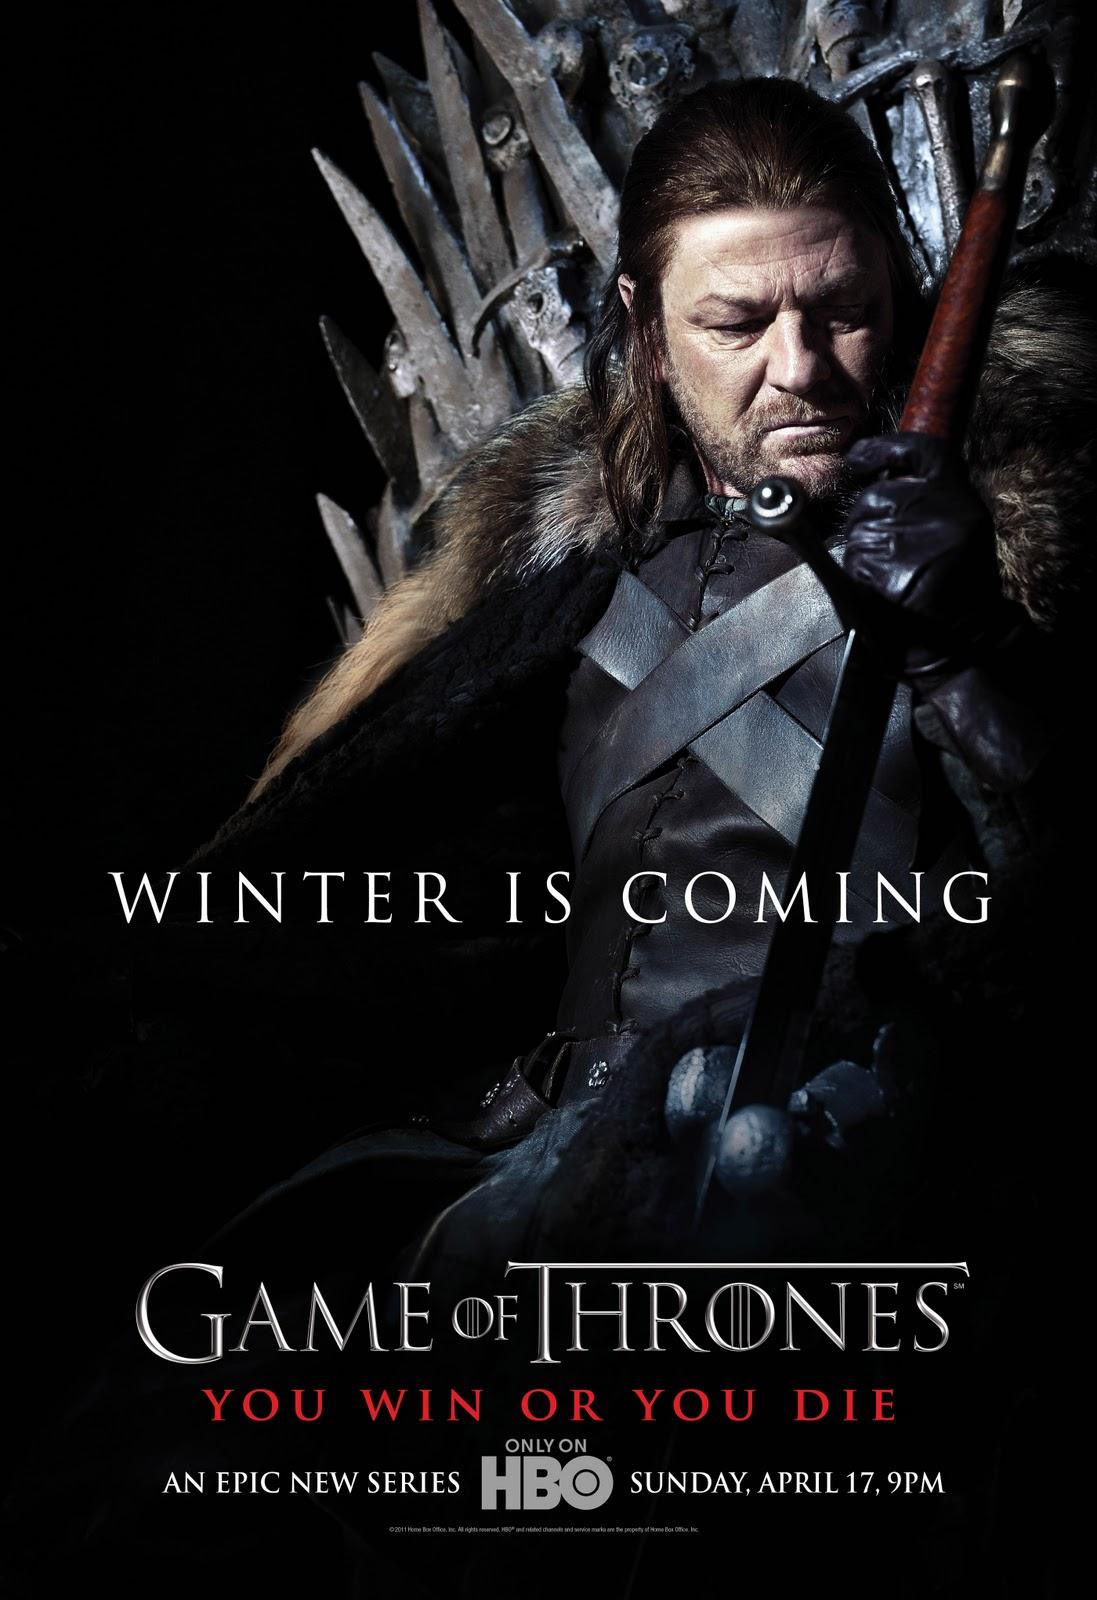 Google chrome themes game of thrones - Google Chrome Themes Game Of Thrones 39